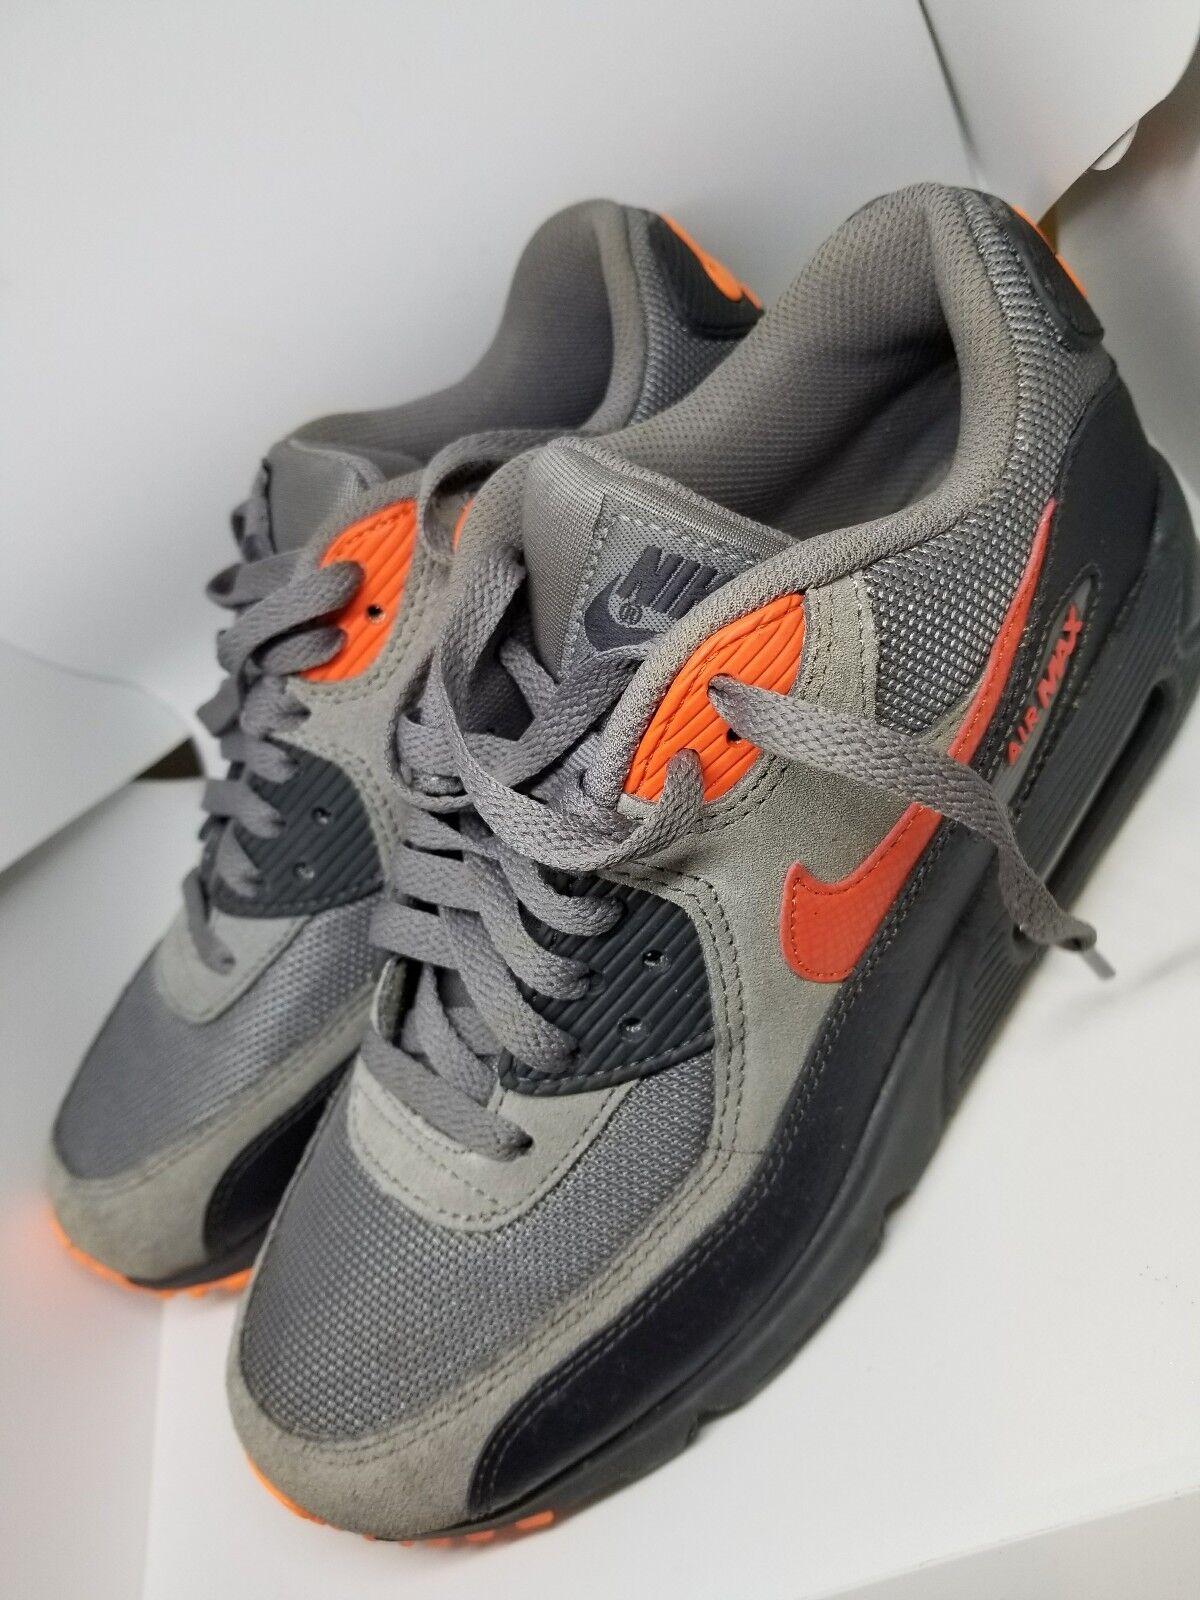 Nike Air Max 90 US BOYS 76 EUR 40 Gris /orange/ noir